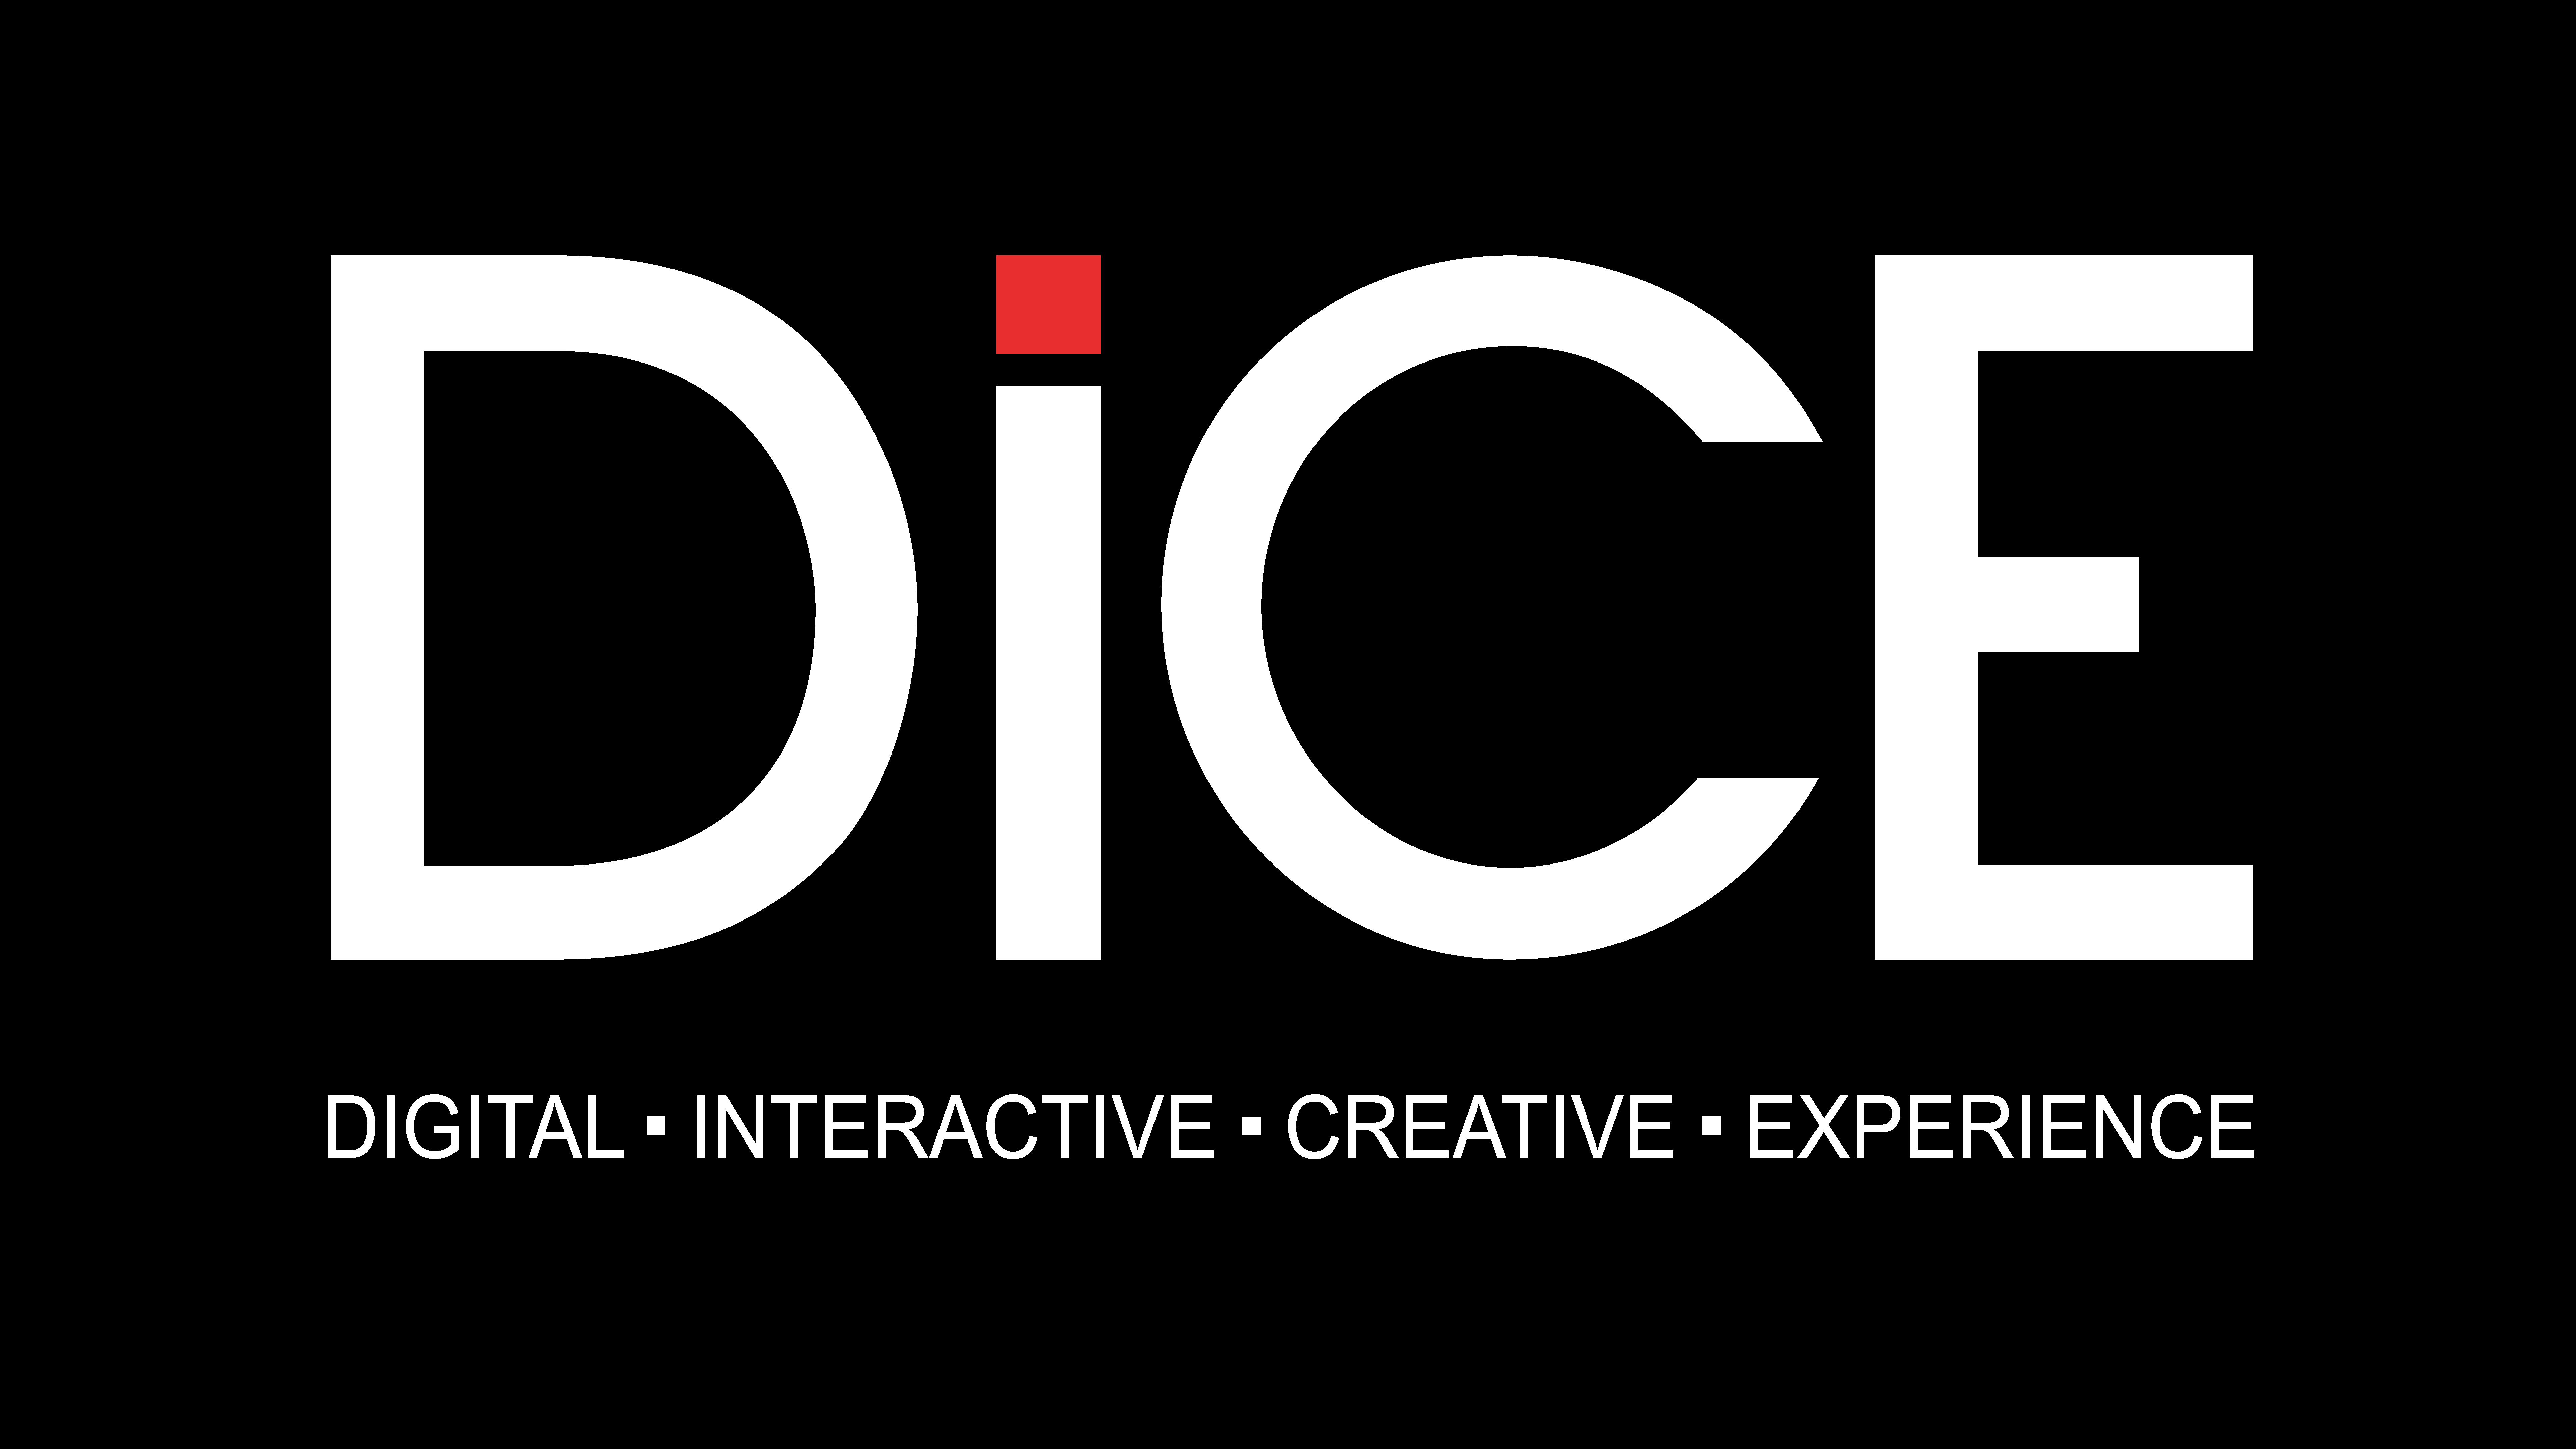 Dice Creation